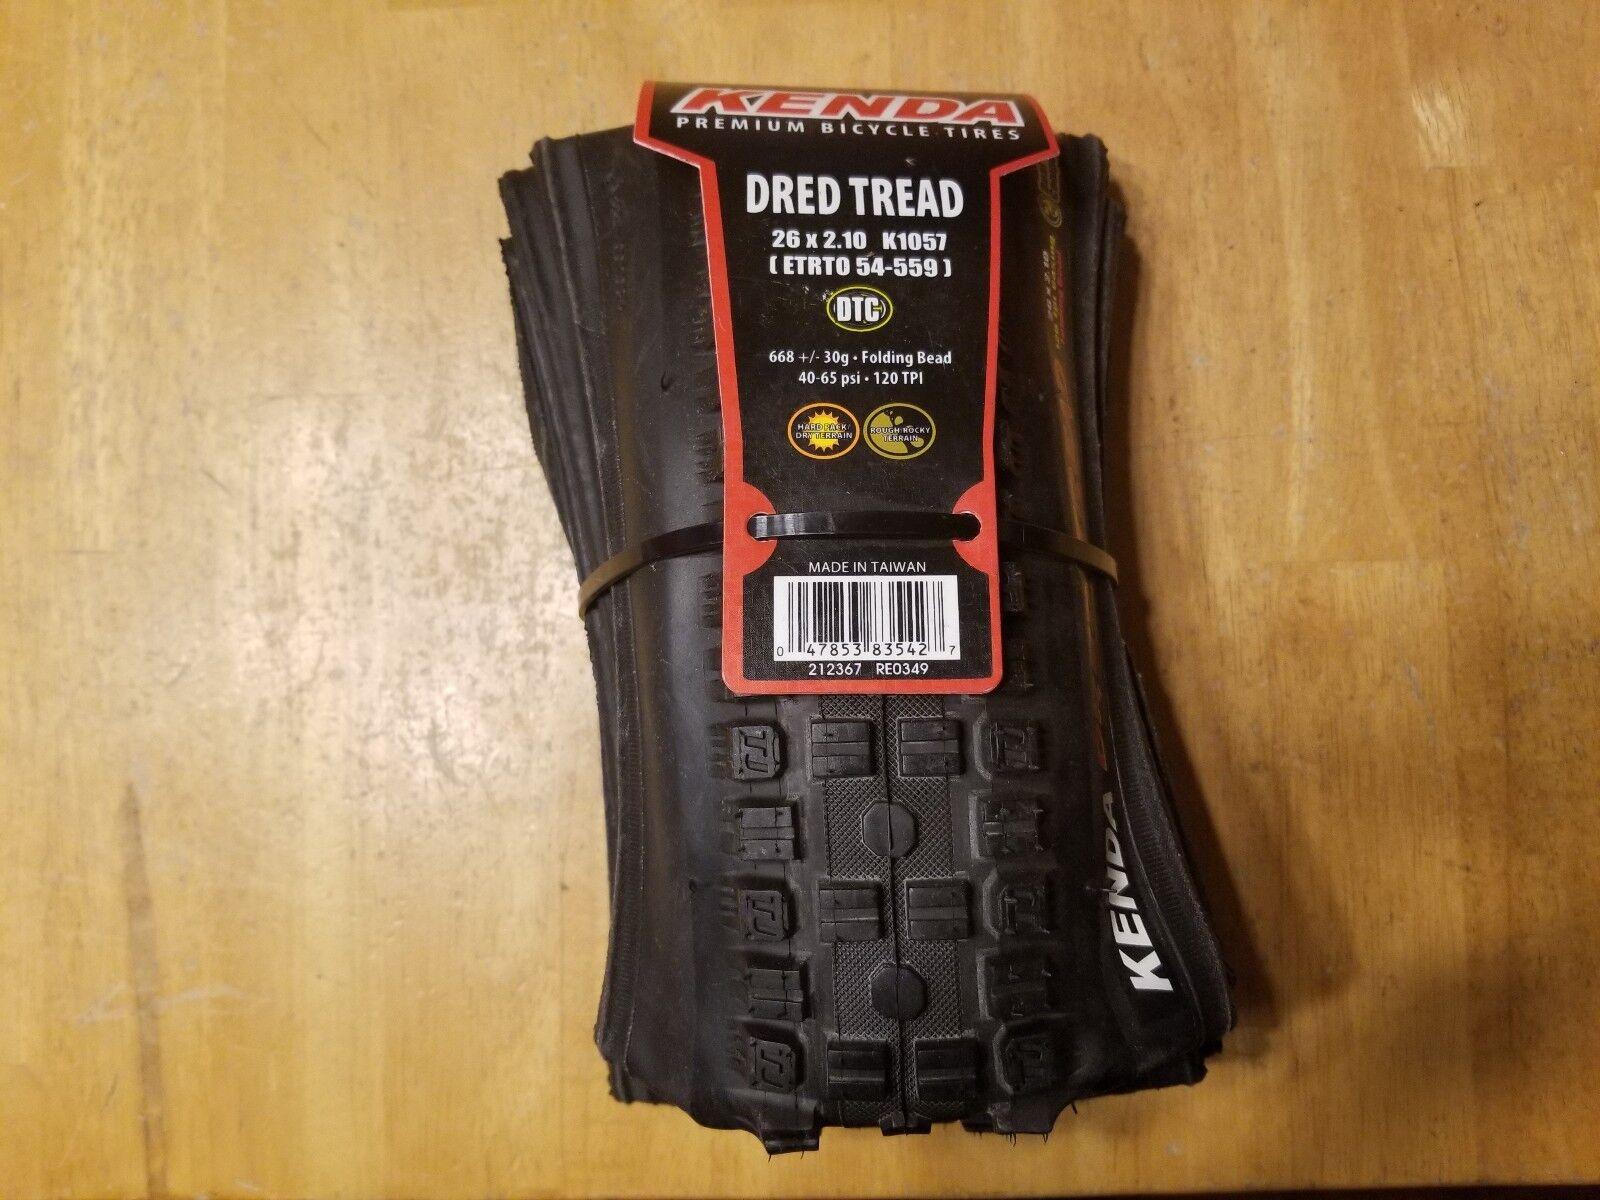 Kenda Dred Tread 26 X 2.10 DTC Mountain Bike Tire - Folding Bead 120 TPI